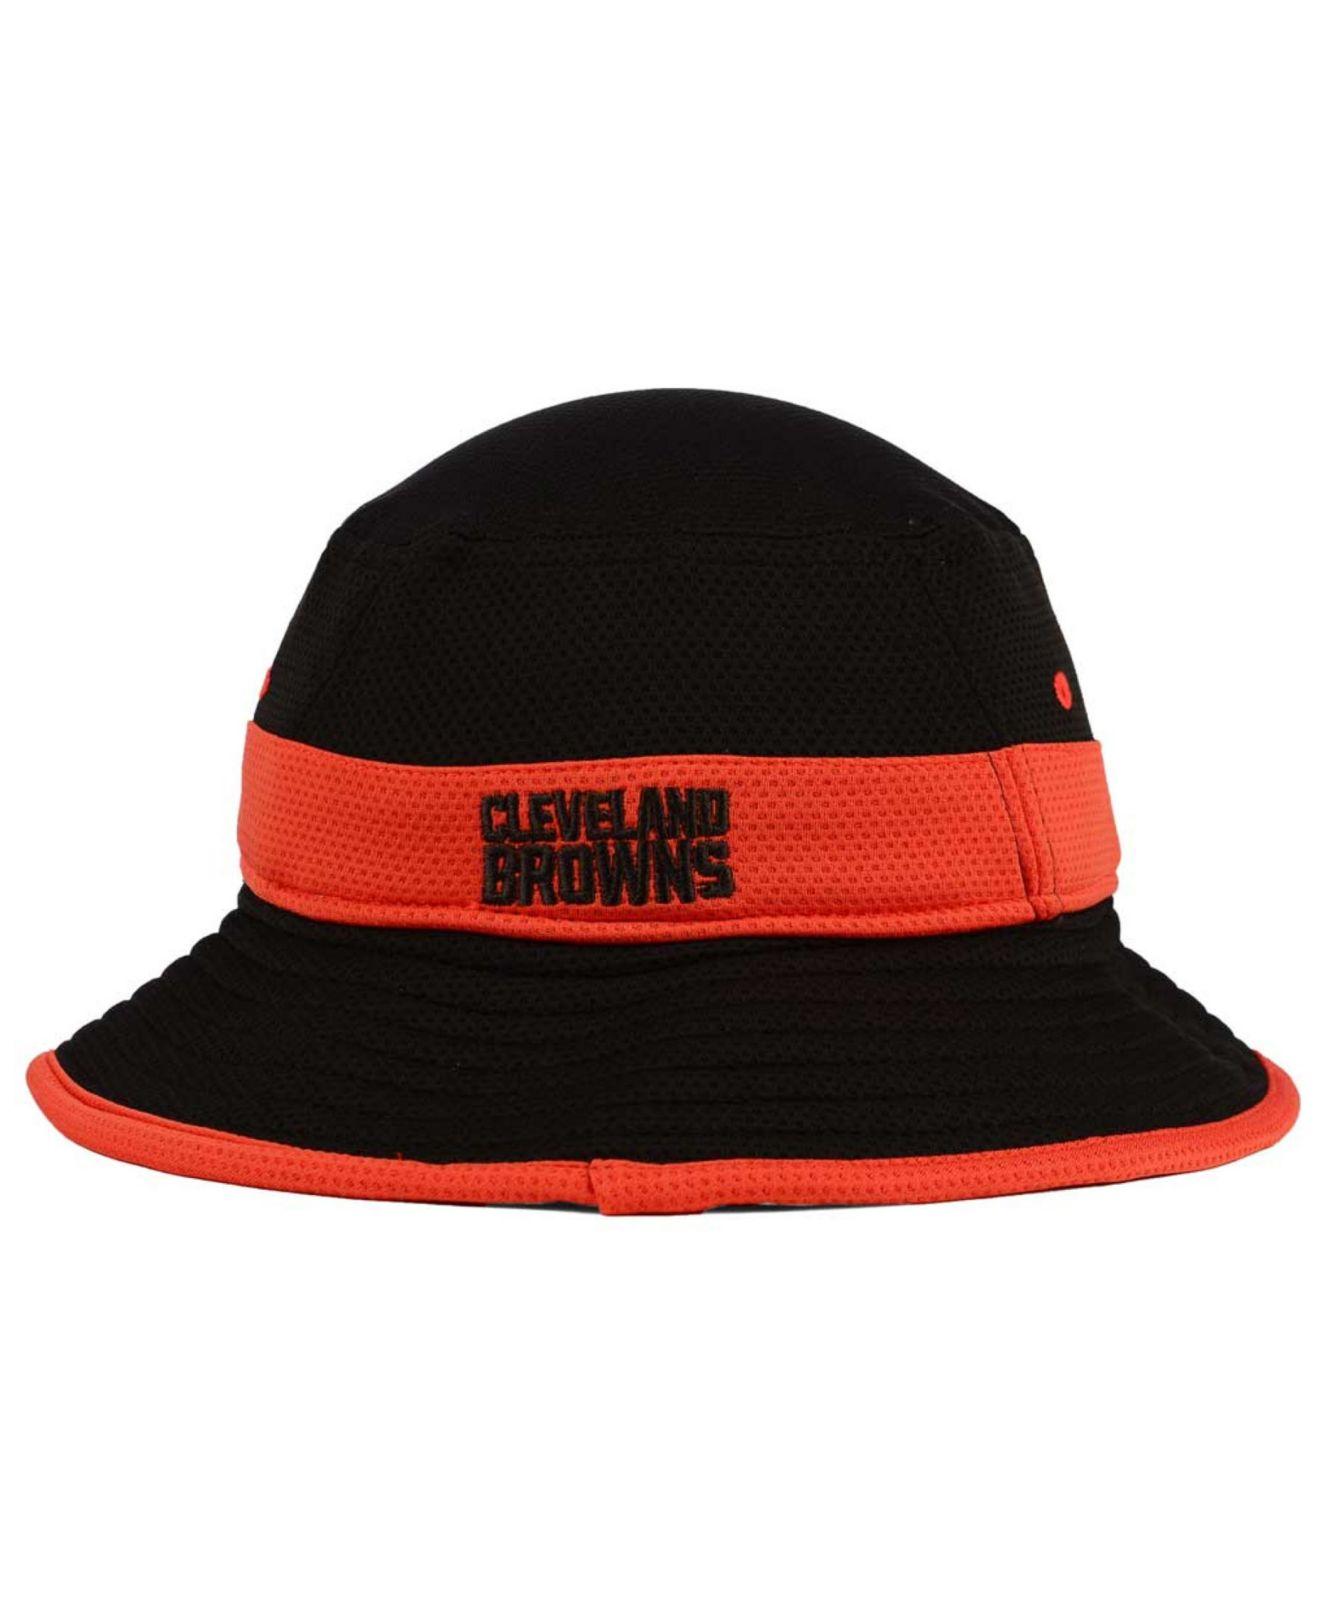 16183bfad Lyst - KTZ Cleveland Browns Training Camp Reverse Bucket Hat in Black for  Men